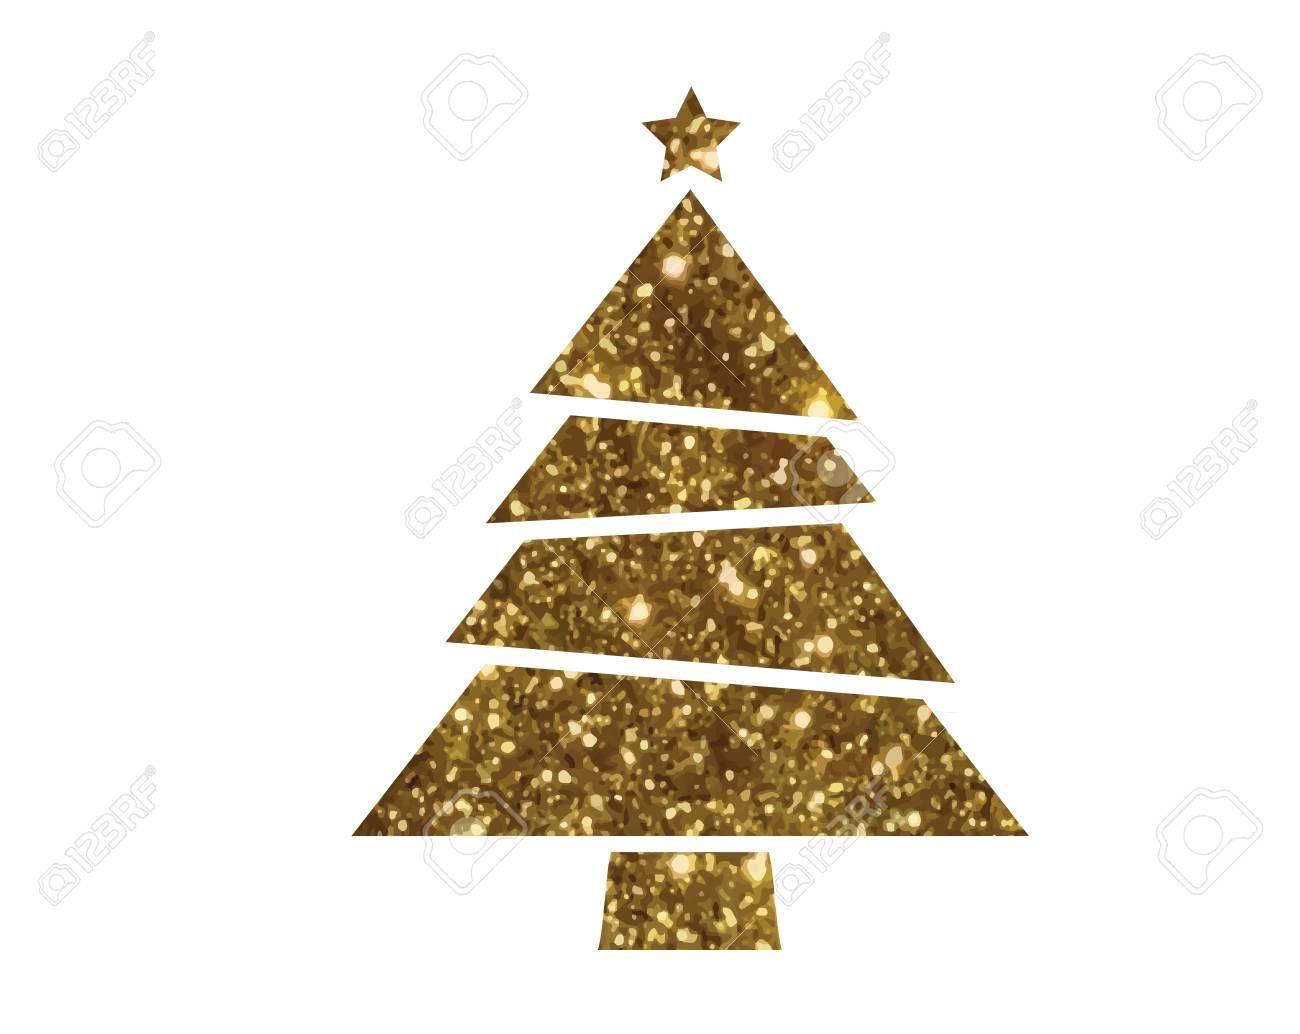 Isolated Vector Golden Glitter Christmas Tree Flat Icon